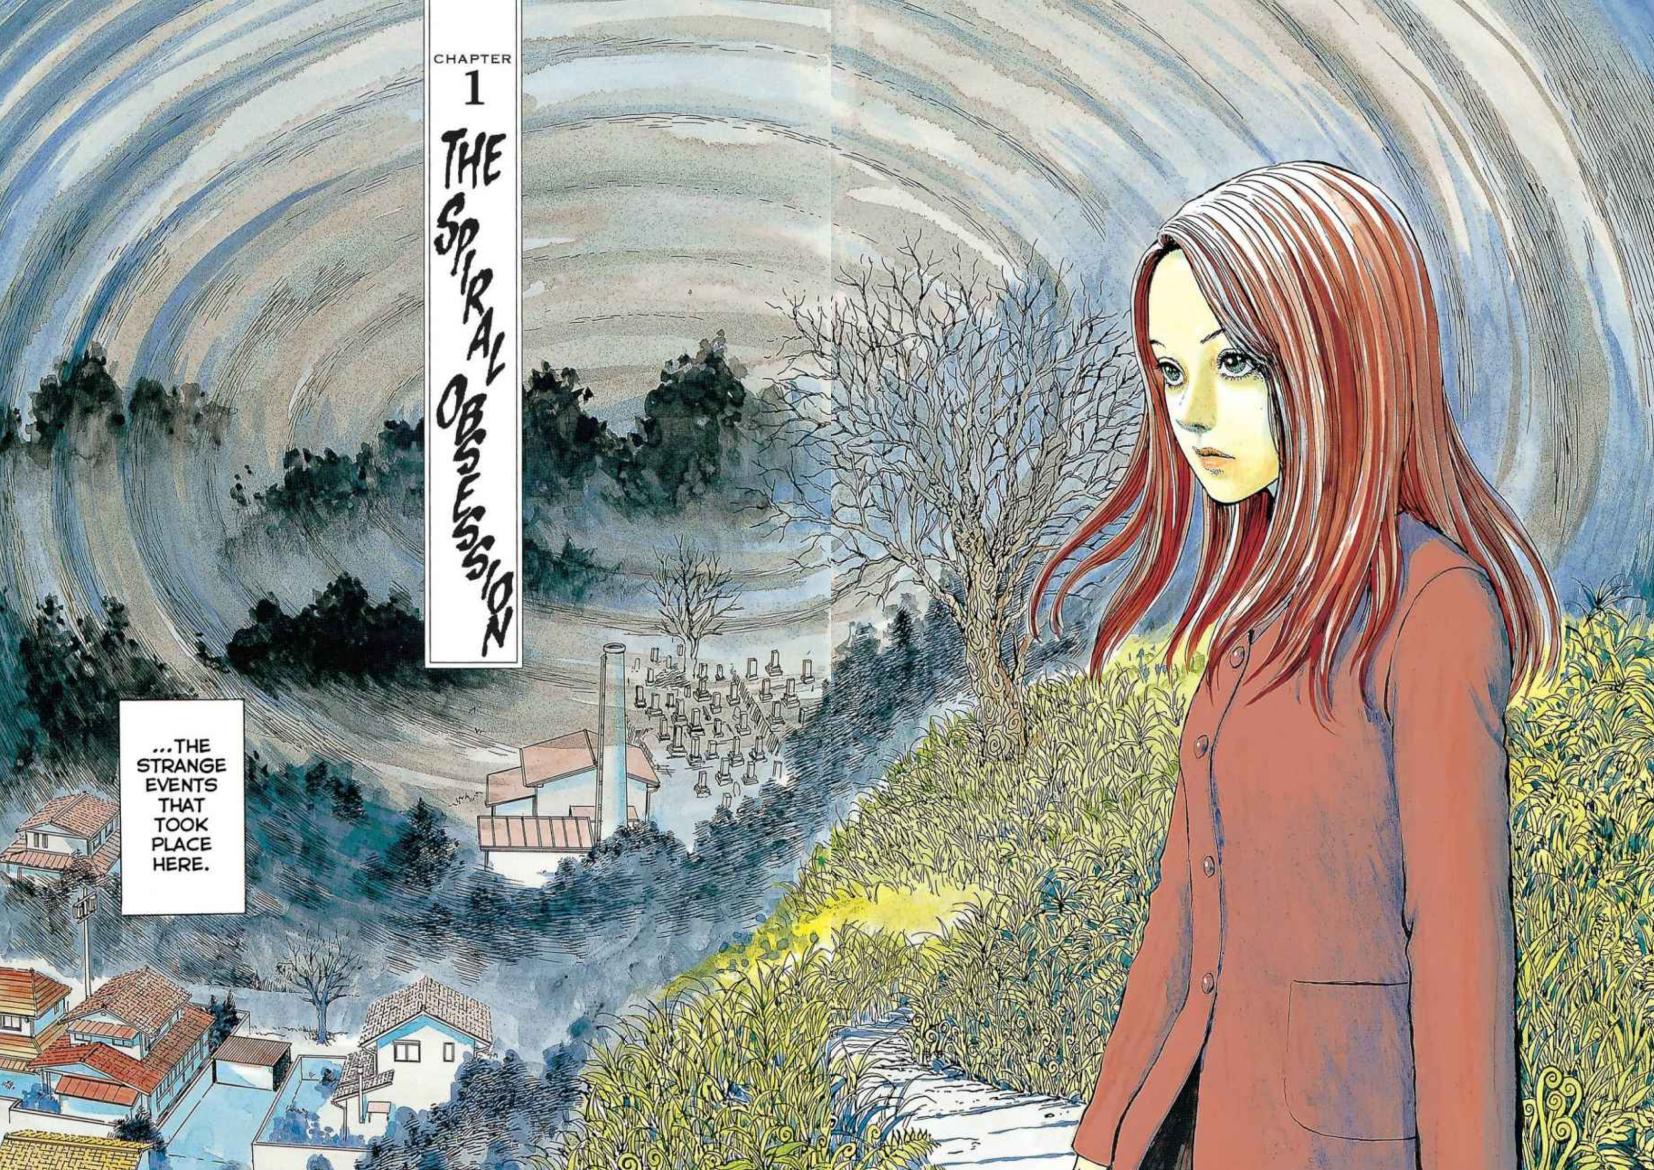 Umazaki Spiral Junji Ito energy moves in spirals